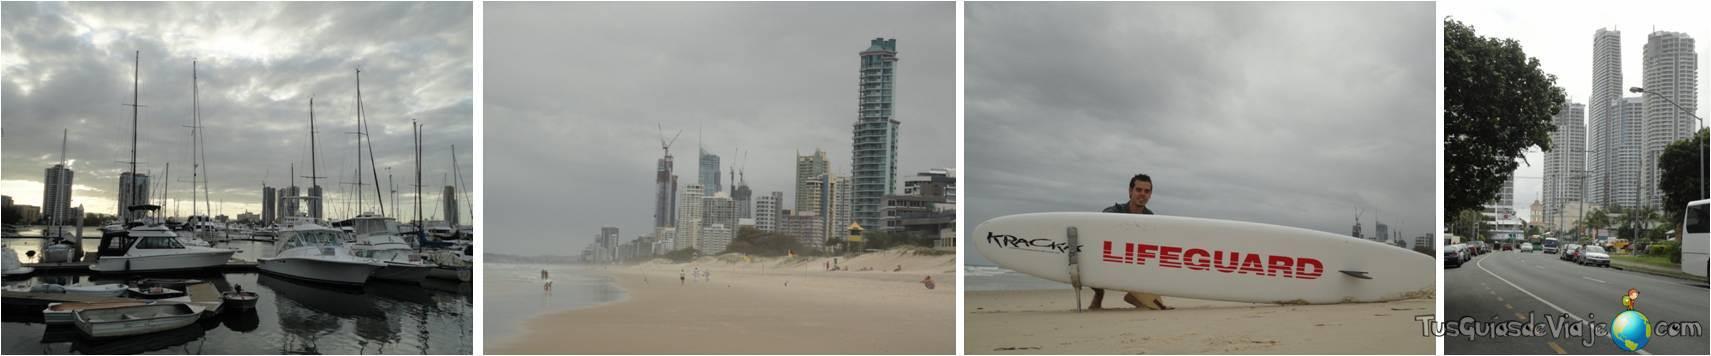 Playa y rascacielos en Surfers Paradise